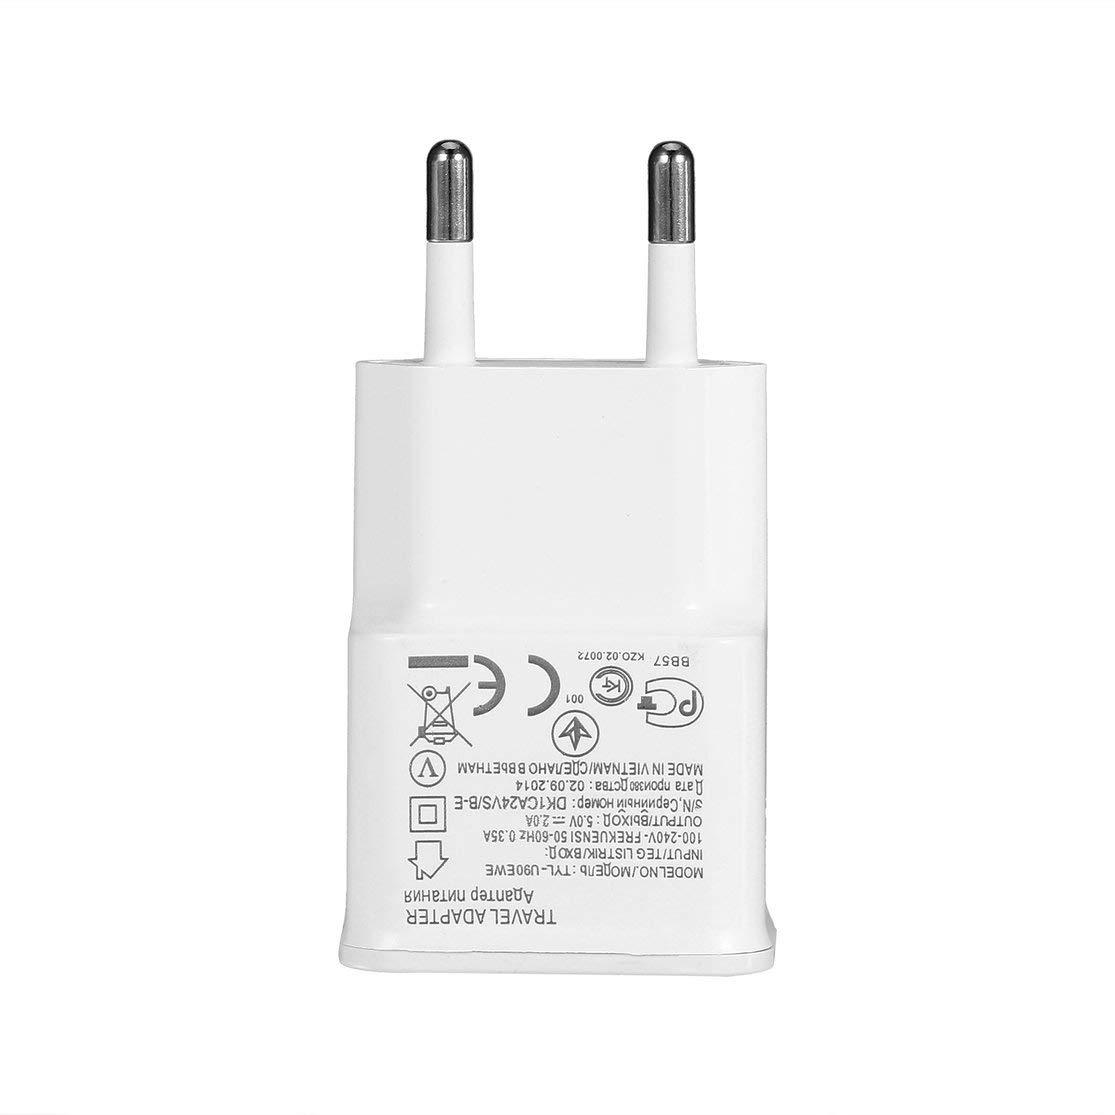 LouiseEvel215 Hei/ßer USB Wand eu ladeger/ät Adapter f/ür samsumg Galaxy Series 7100 s3 s4 i9500 neueste Ankunft handys zubeh/ör